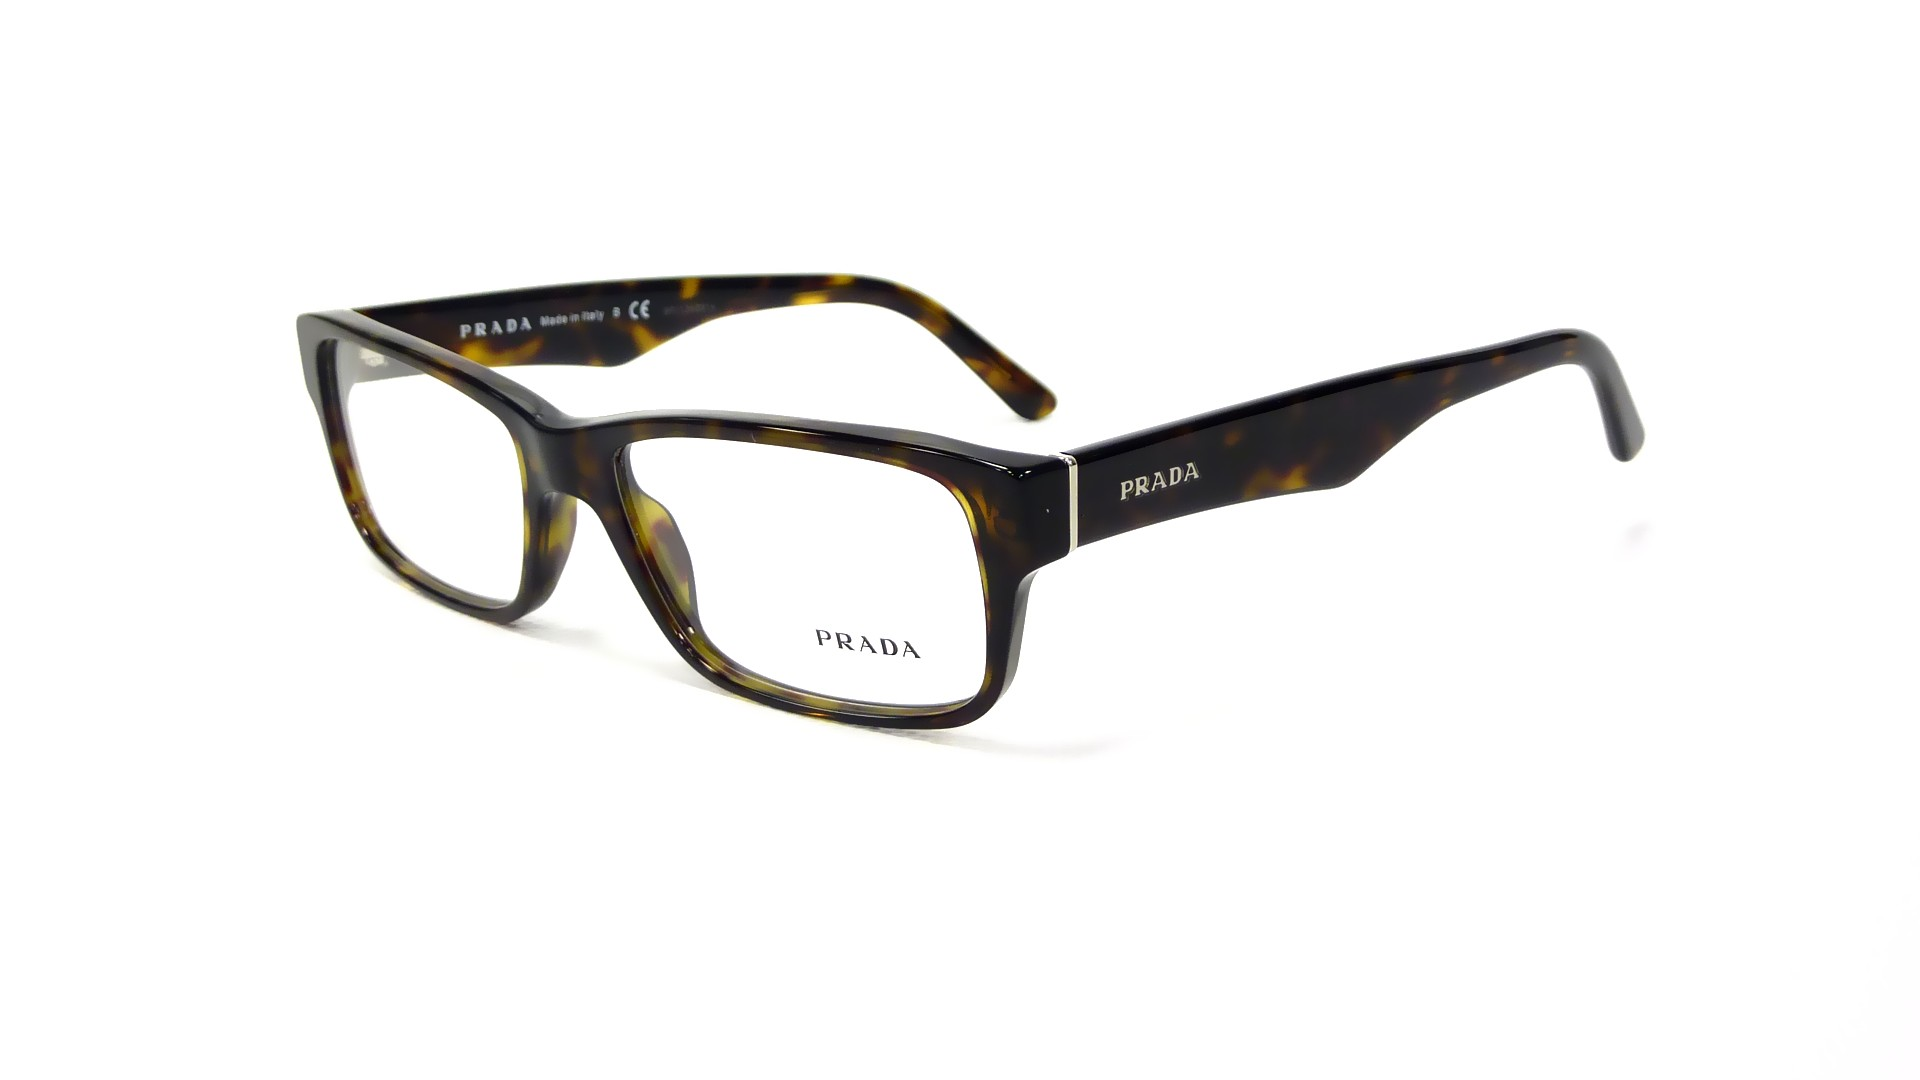 63e6f03da788 Eyeglass Frames 53 16 140 - Bitterroot Public Library